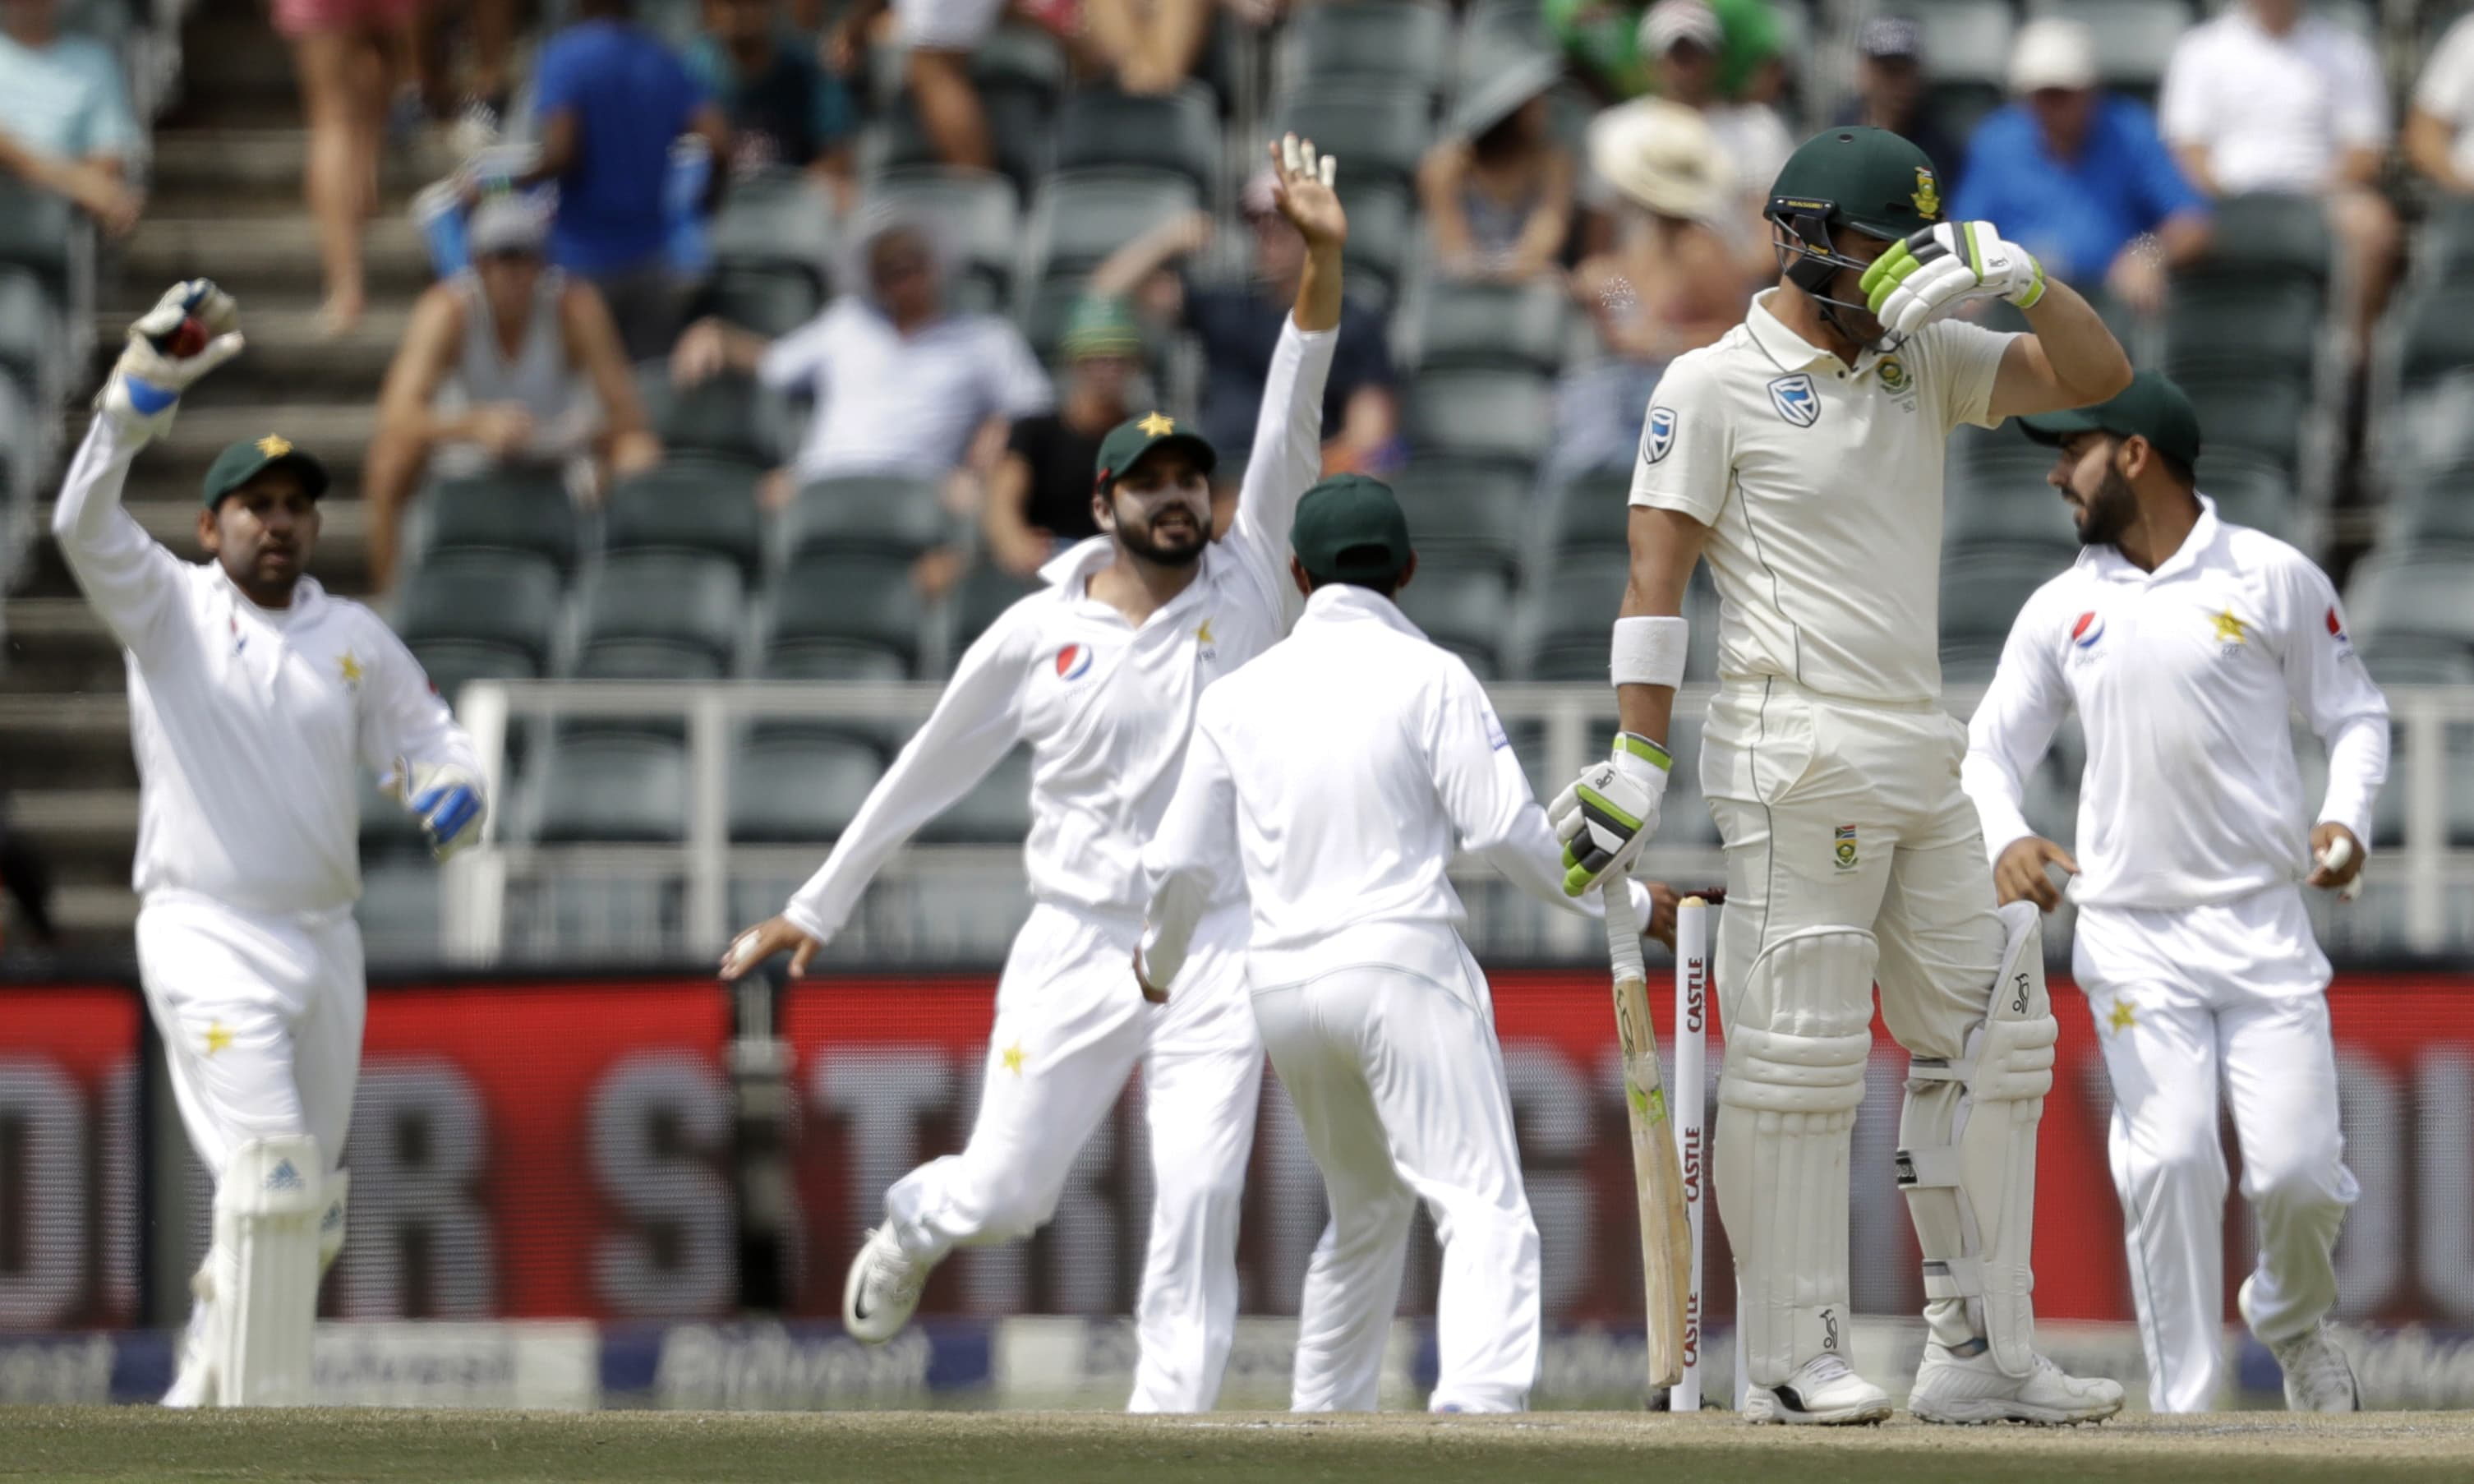 South Africa's batsman Dean Elgar reacts as Pakistan players celebrates his wicket. —AP